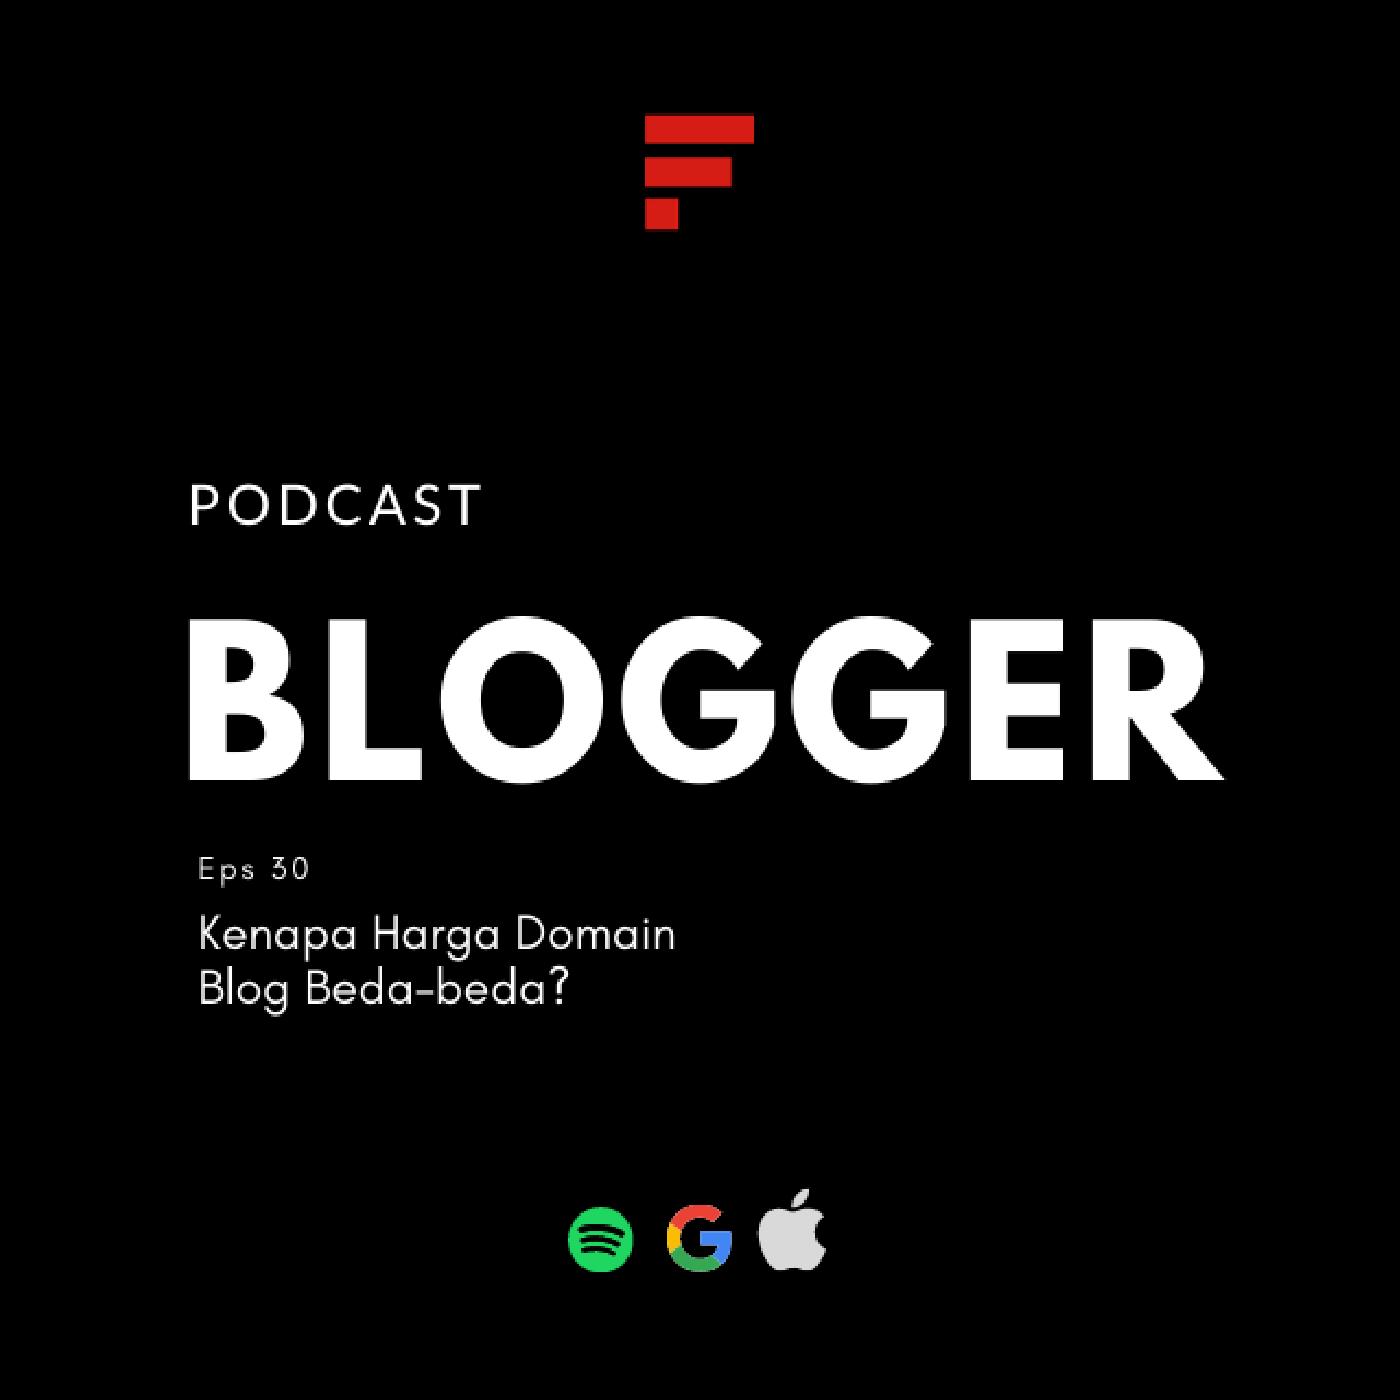 EPS30: Kenapa Harga Domain Blog Beda-beda?